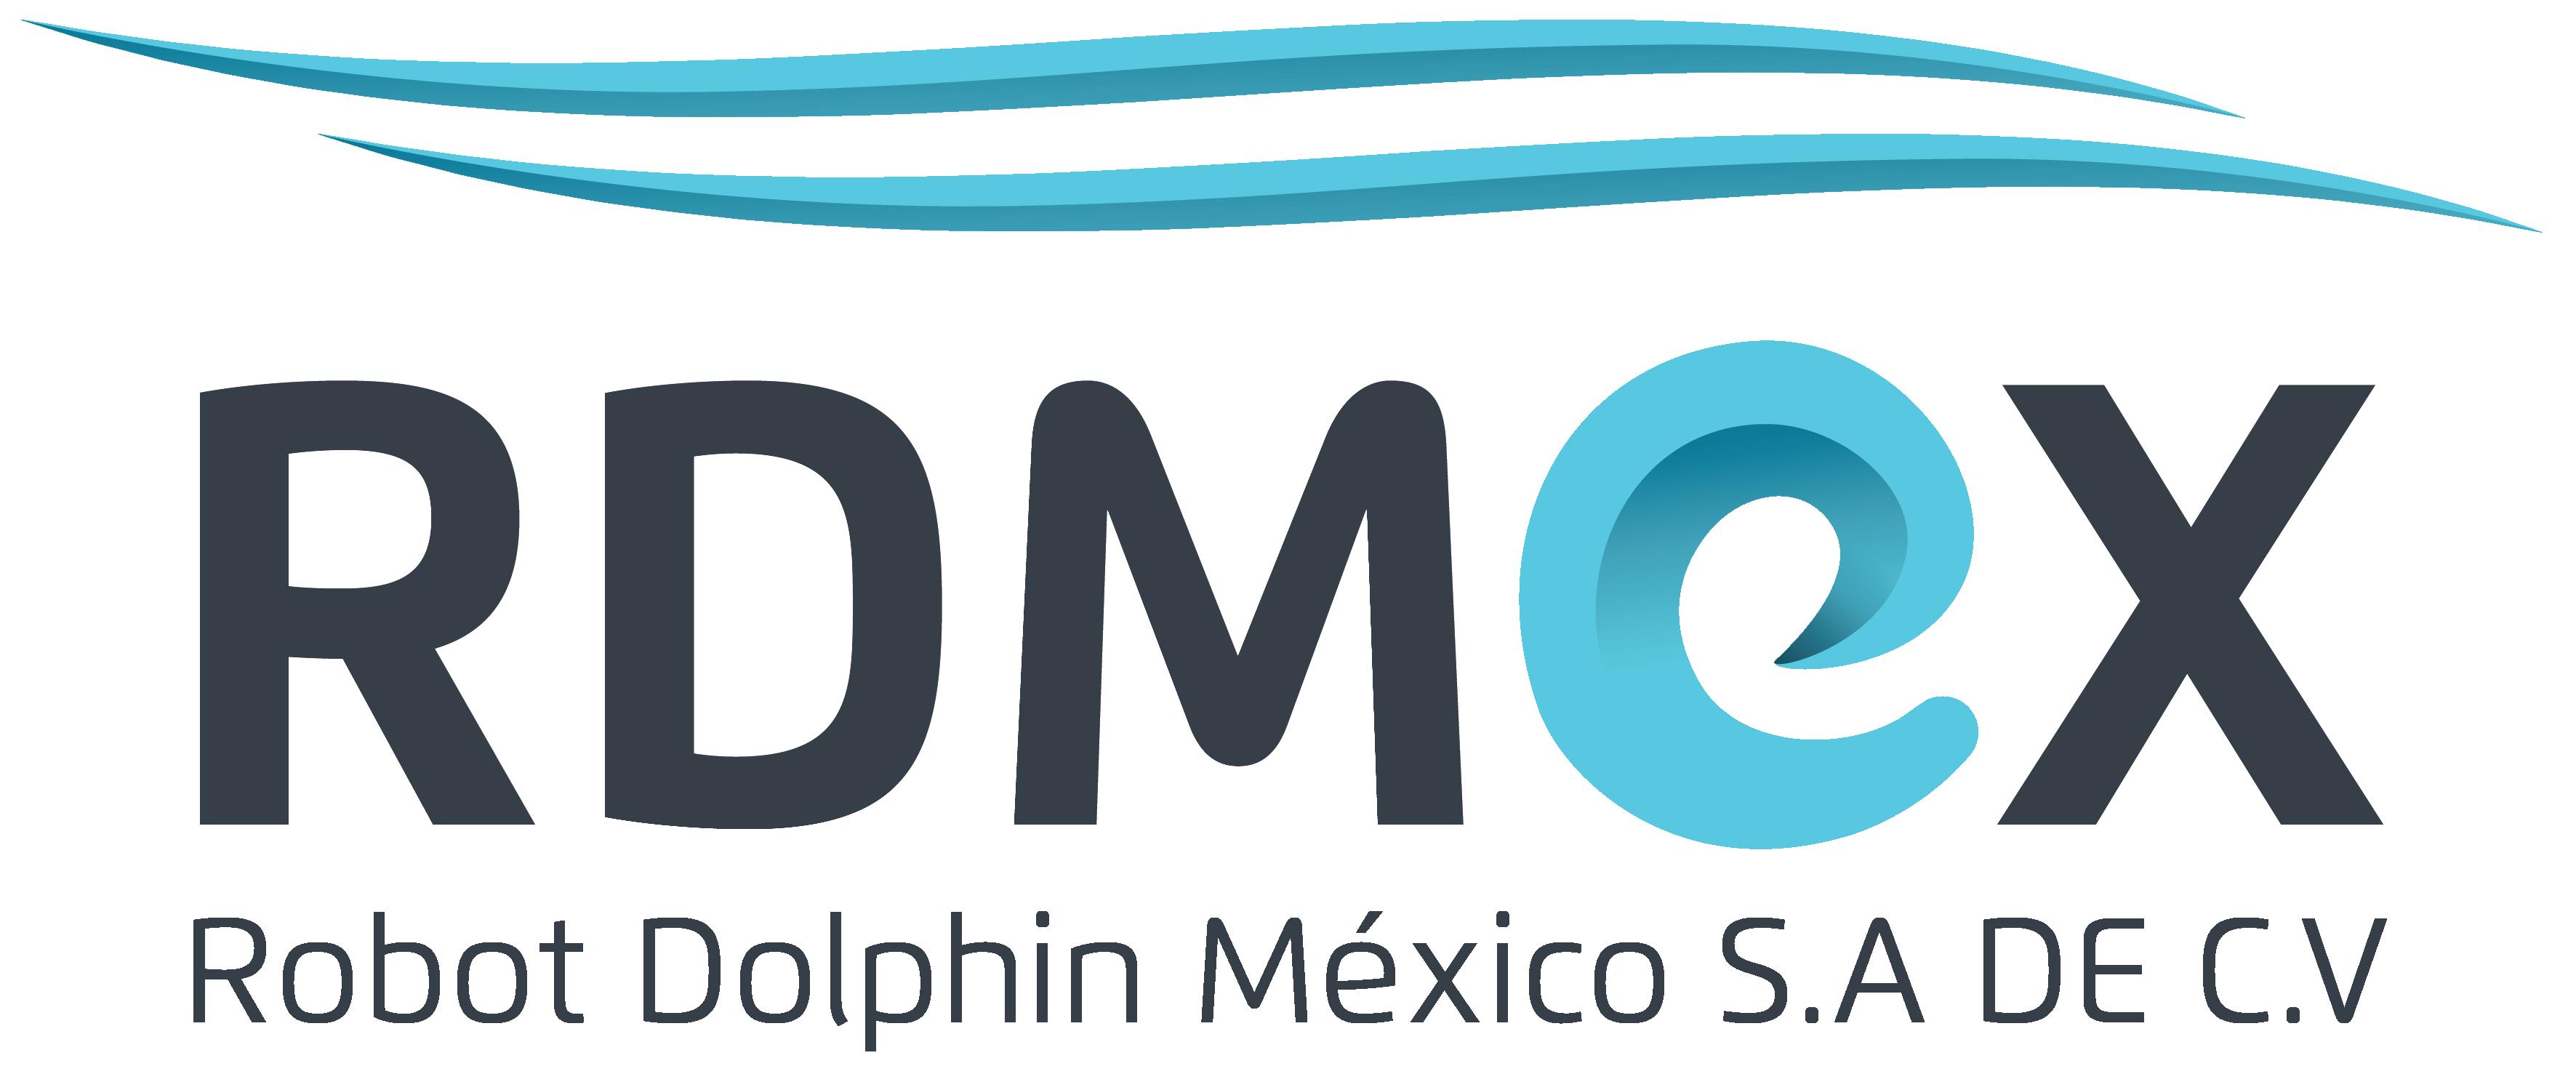 https://e-commerceagency.co.uk/cmspro/wp-content/uploads1283//2019/08/RDMEX.png